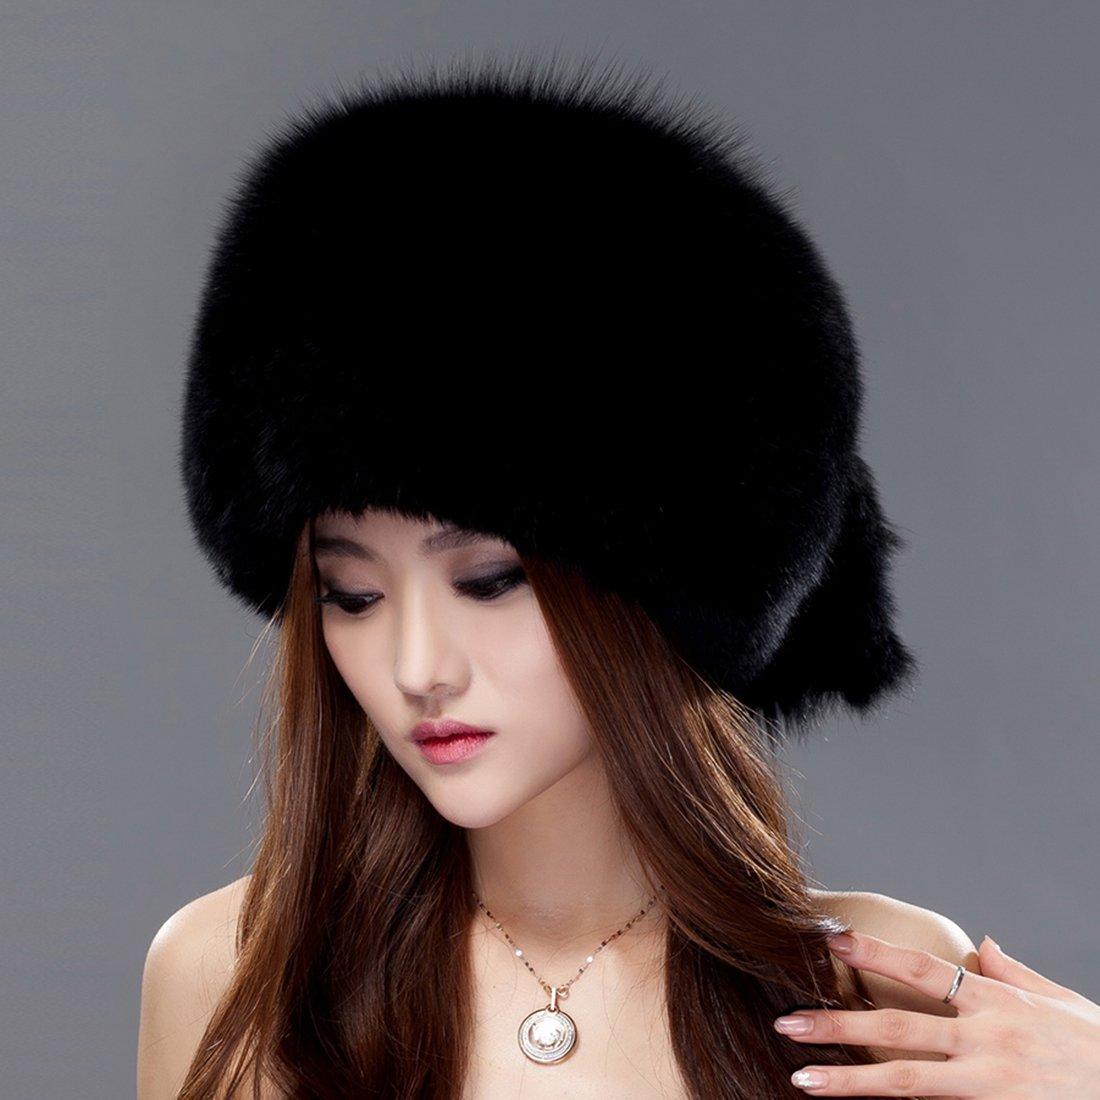 Ursfur Women Autumn Winter Beanies Elastic Knitted Wool Cotton Hats Extech Ct70 Ac Circuit Load Tester Multicolor Ltd